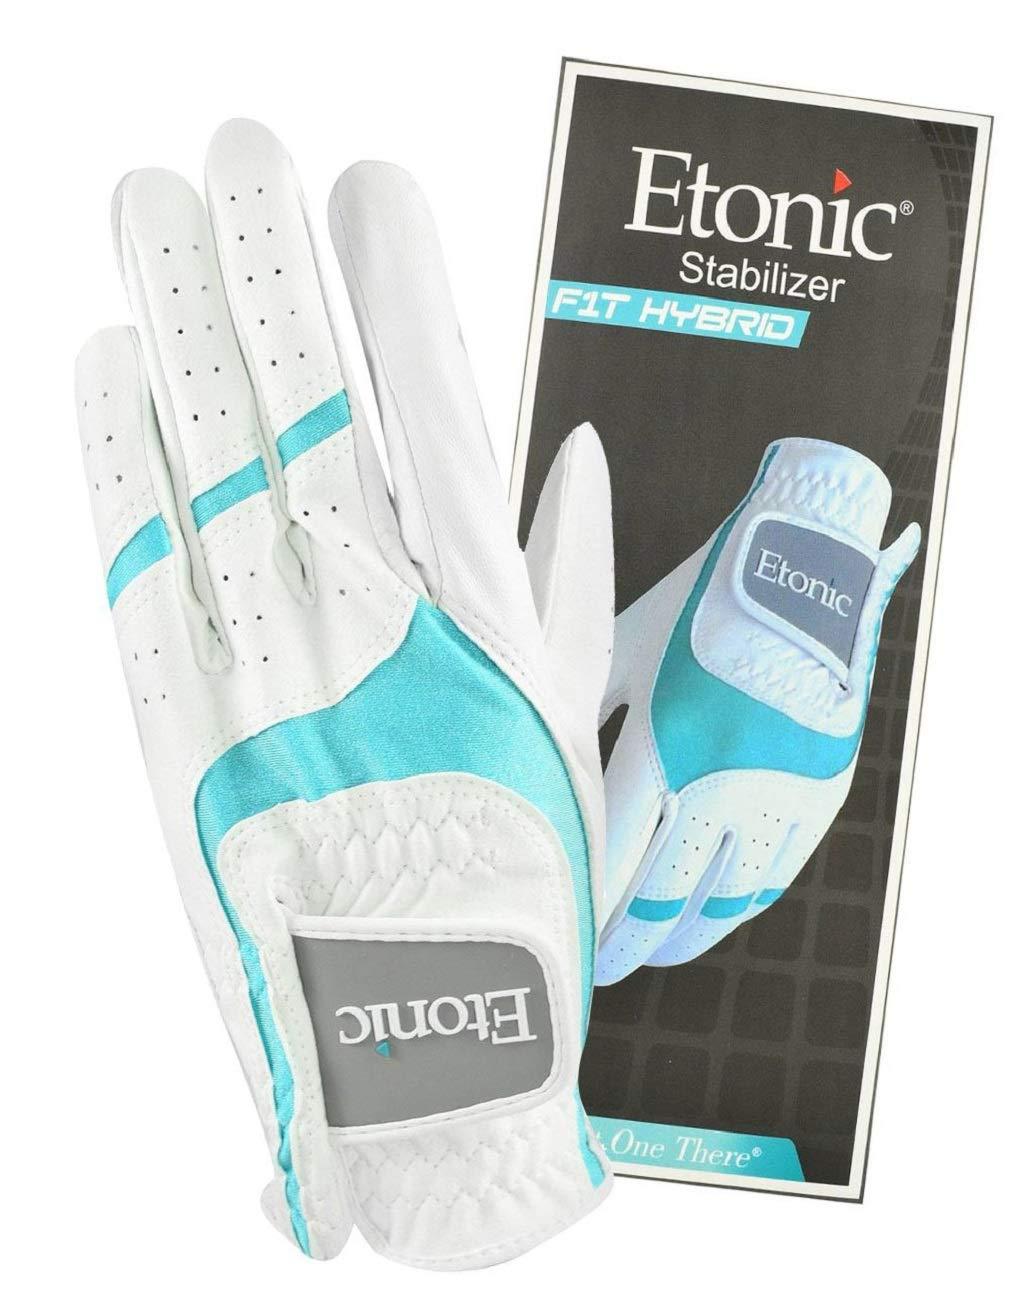 EtonicスタビライザーレディーF1TハイブリッドLlh手袋、ミディアム、ホワイト B07B6R485S